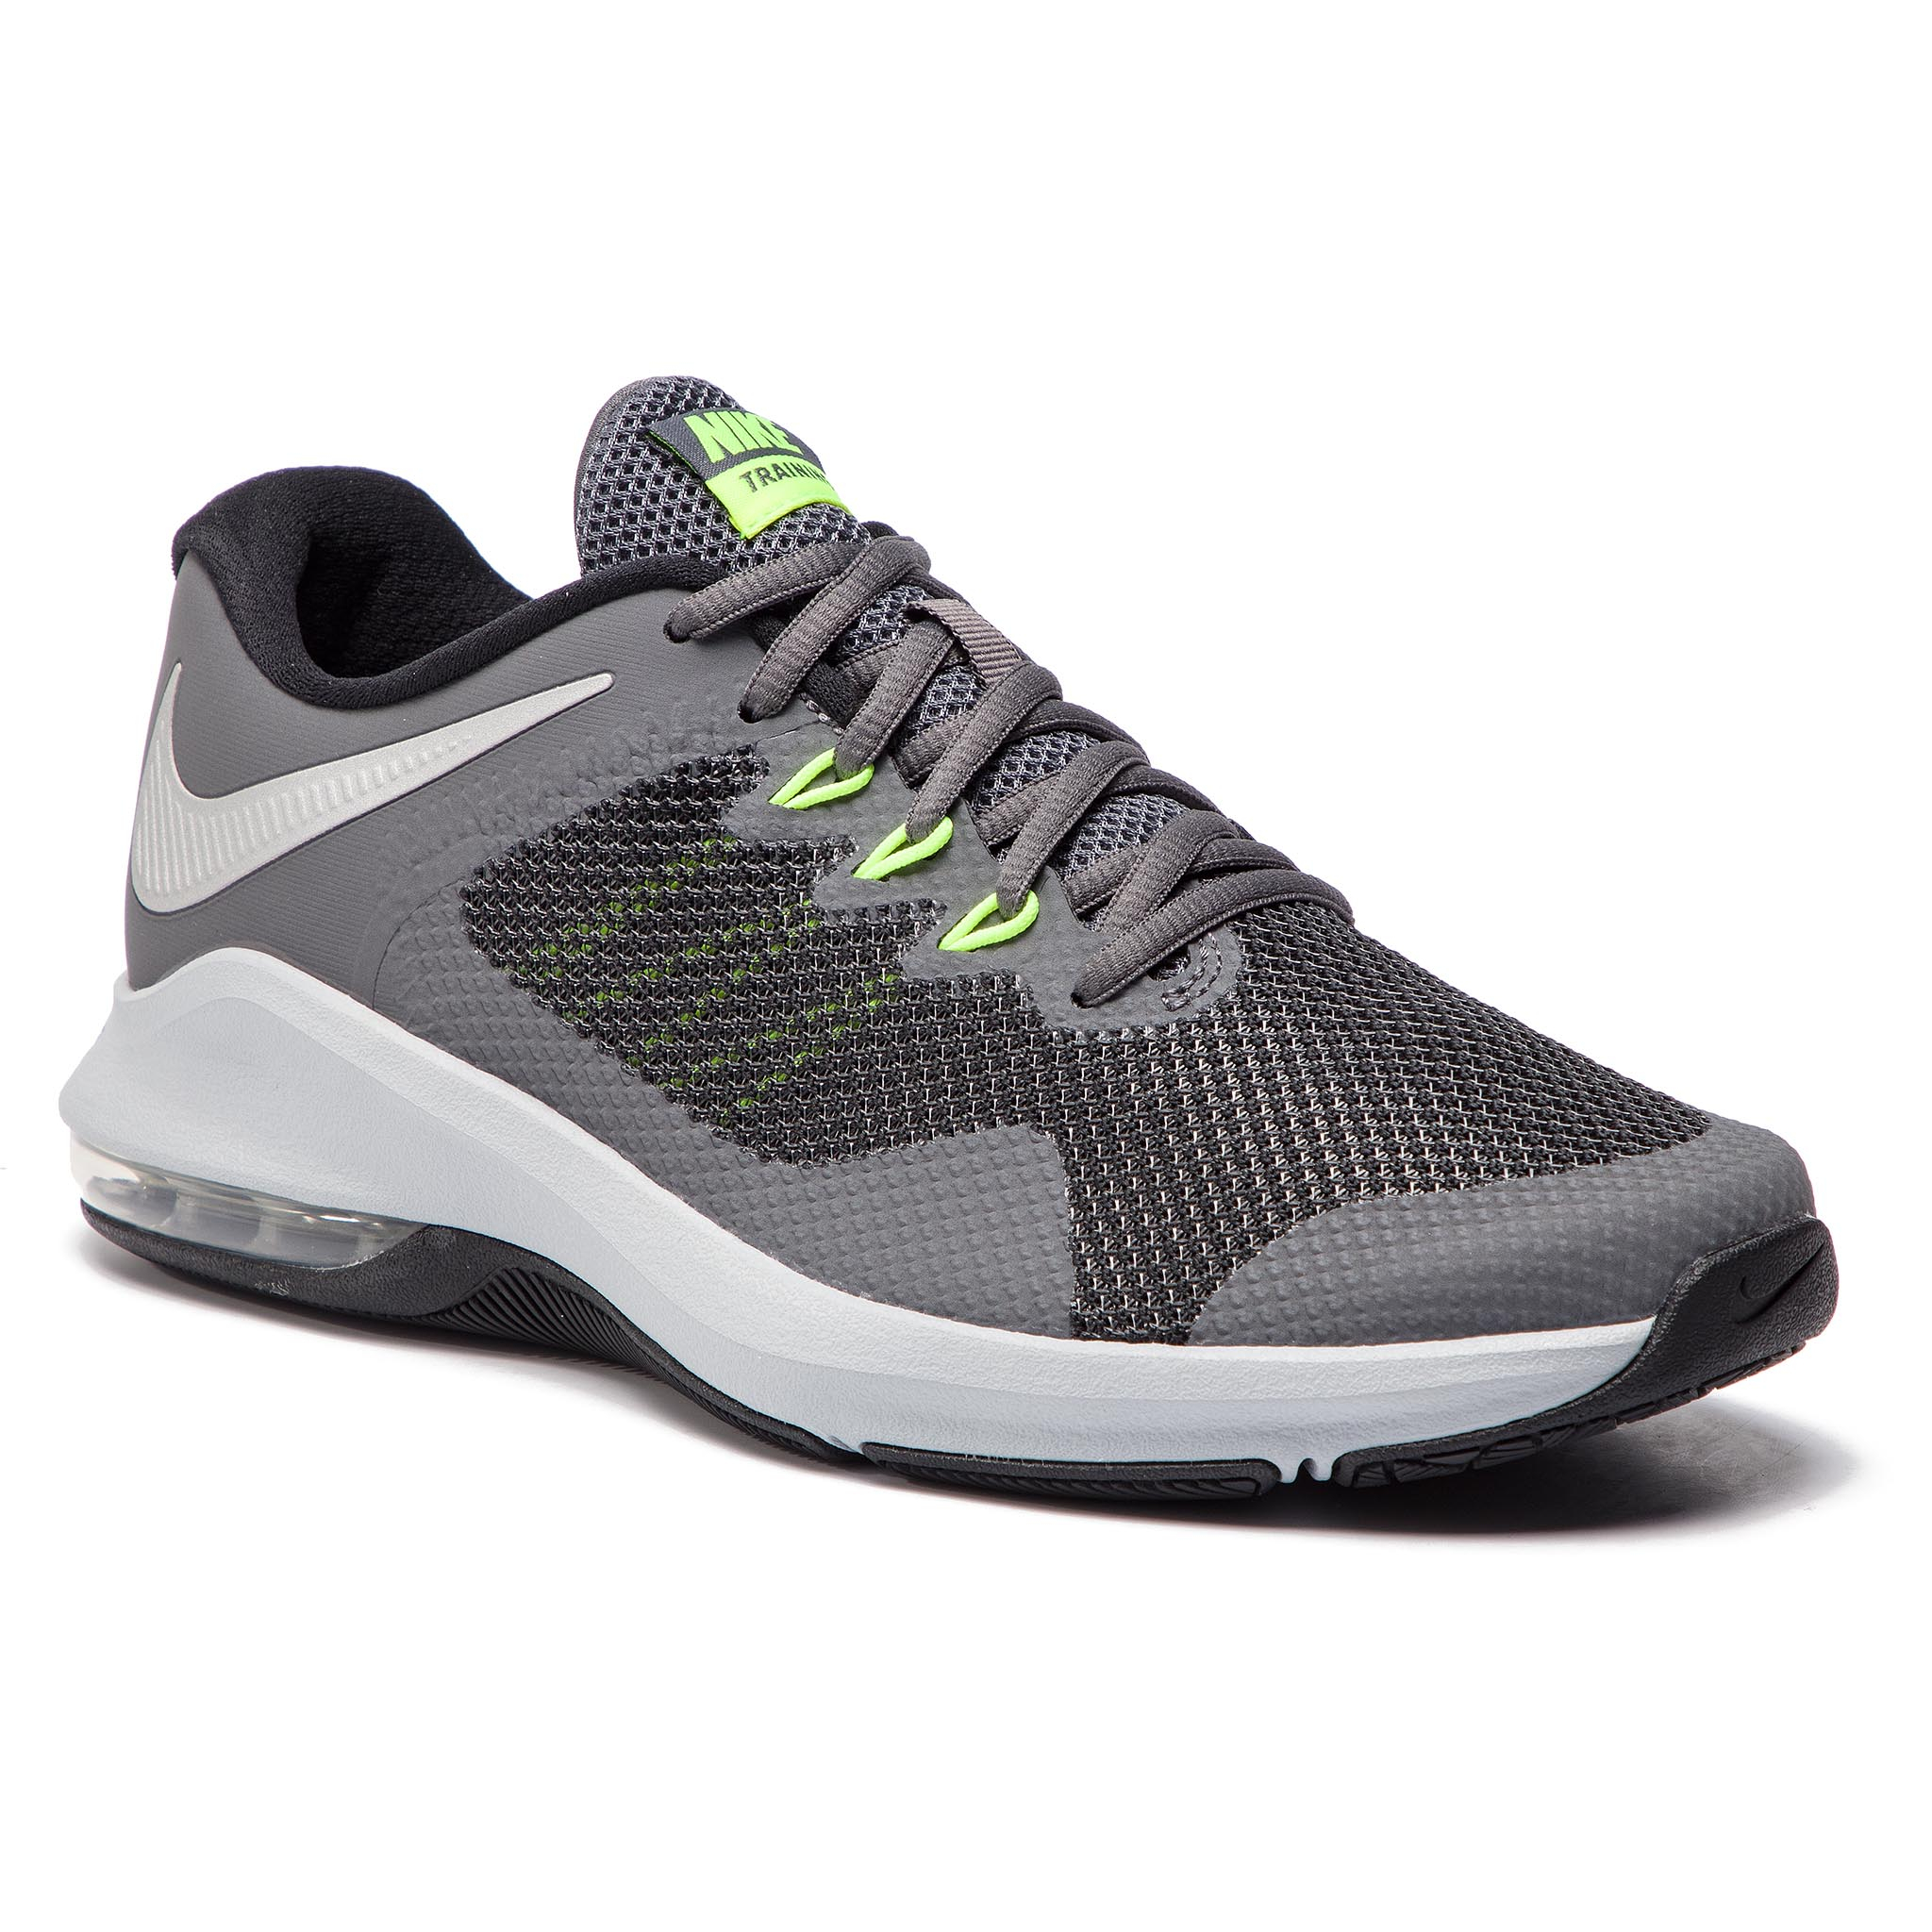 621db887a15 Shoes NIKE - Air Zoom Pegasus 35 942851 008 Gridiron Laser Orange ...